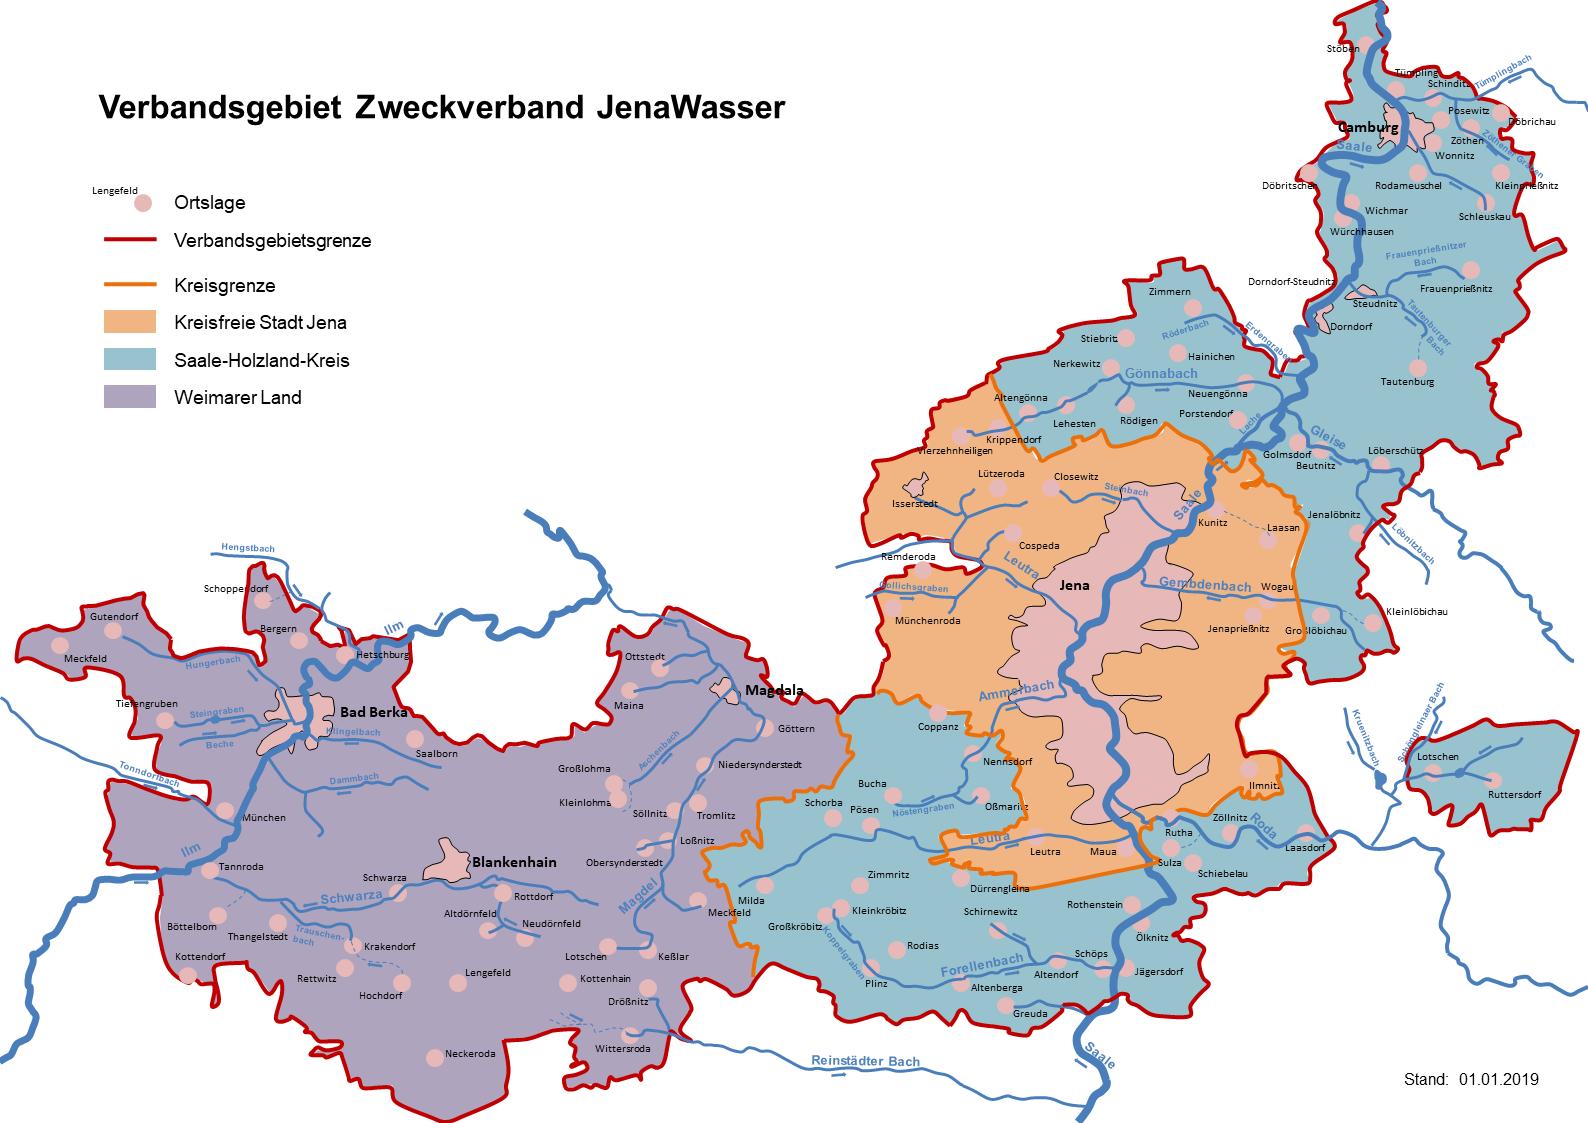 Verbandsgebiet, JenaWasser